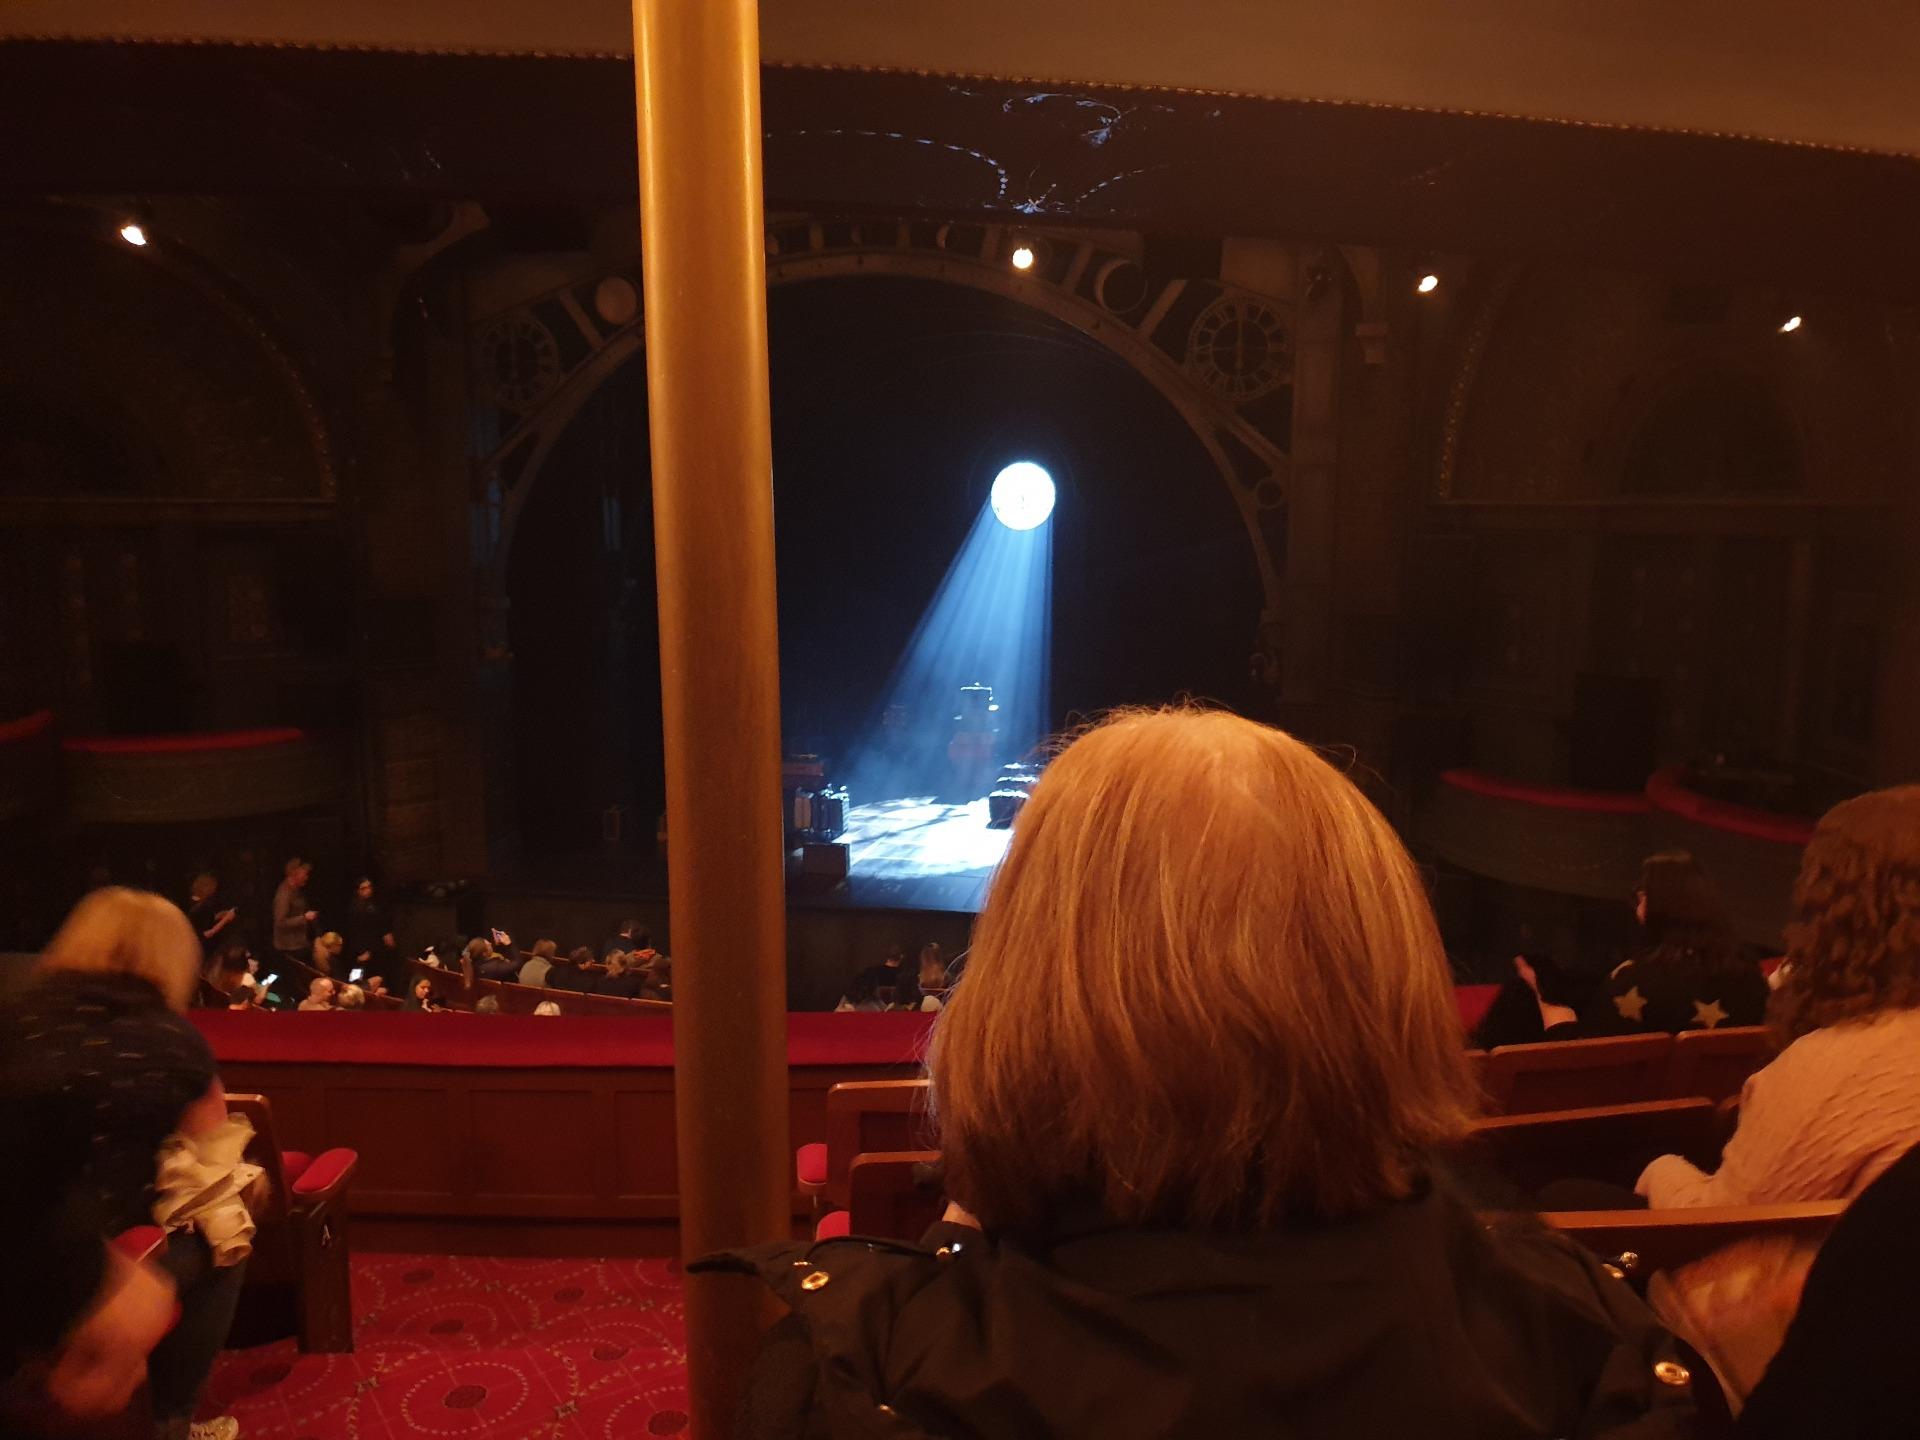 Princess Theatre (Melbourne) Section Dress Circle Row E Seat 29